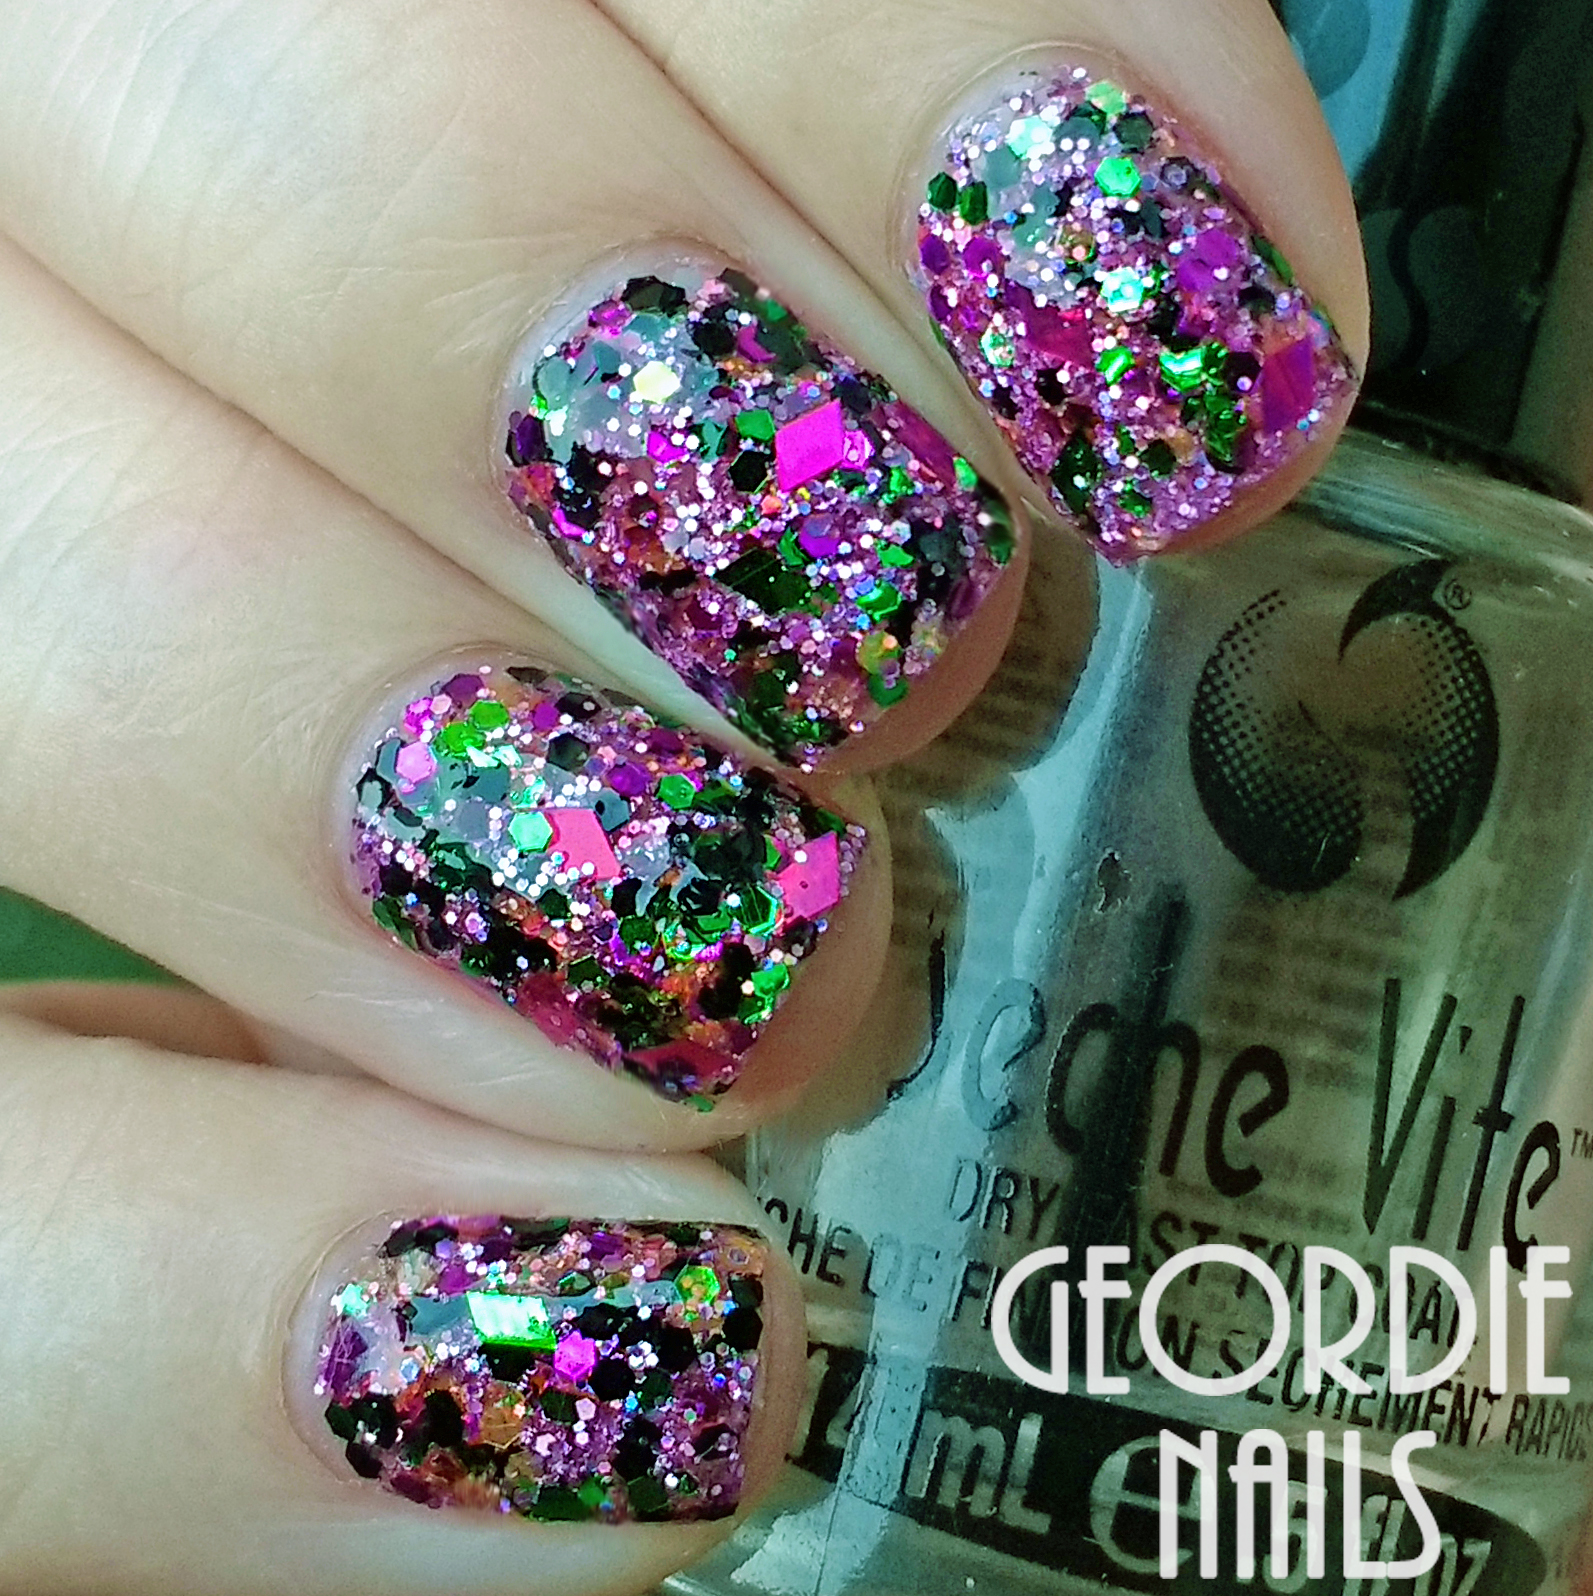 Geordie Nails: Charlies Nail Art ~ Hocus Pocus Glitter Mix